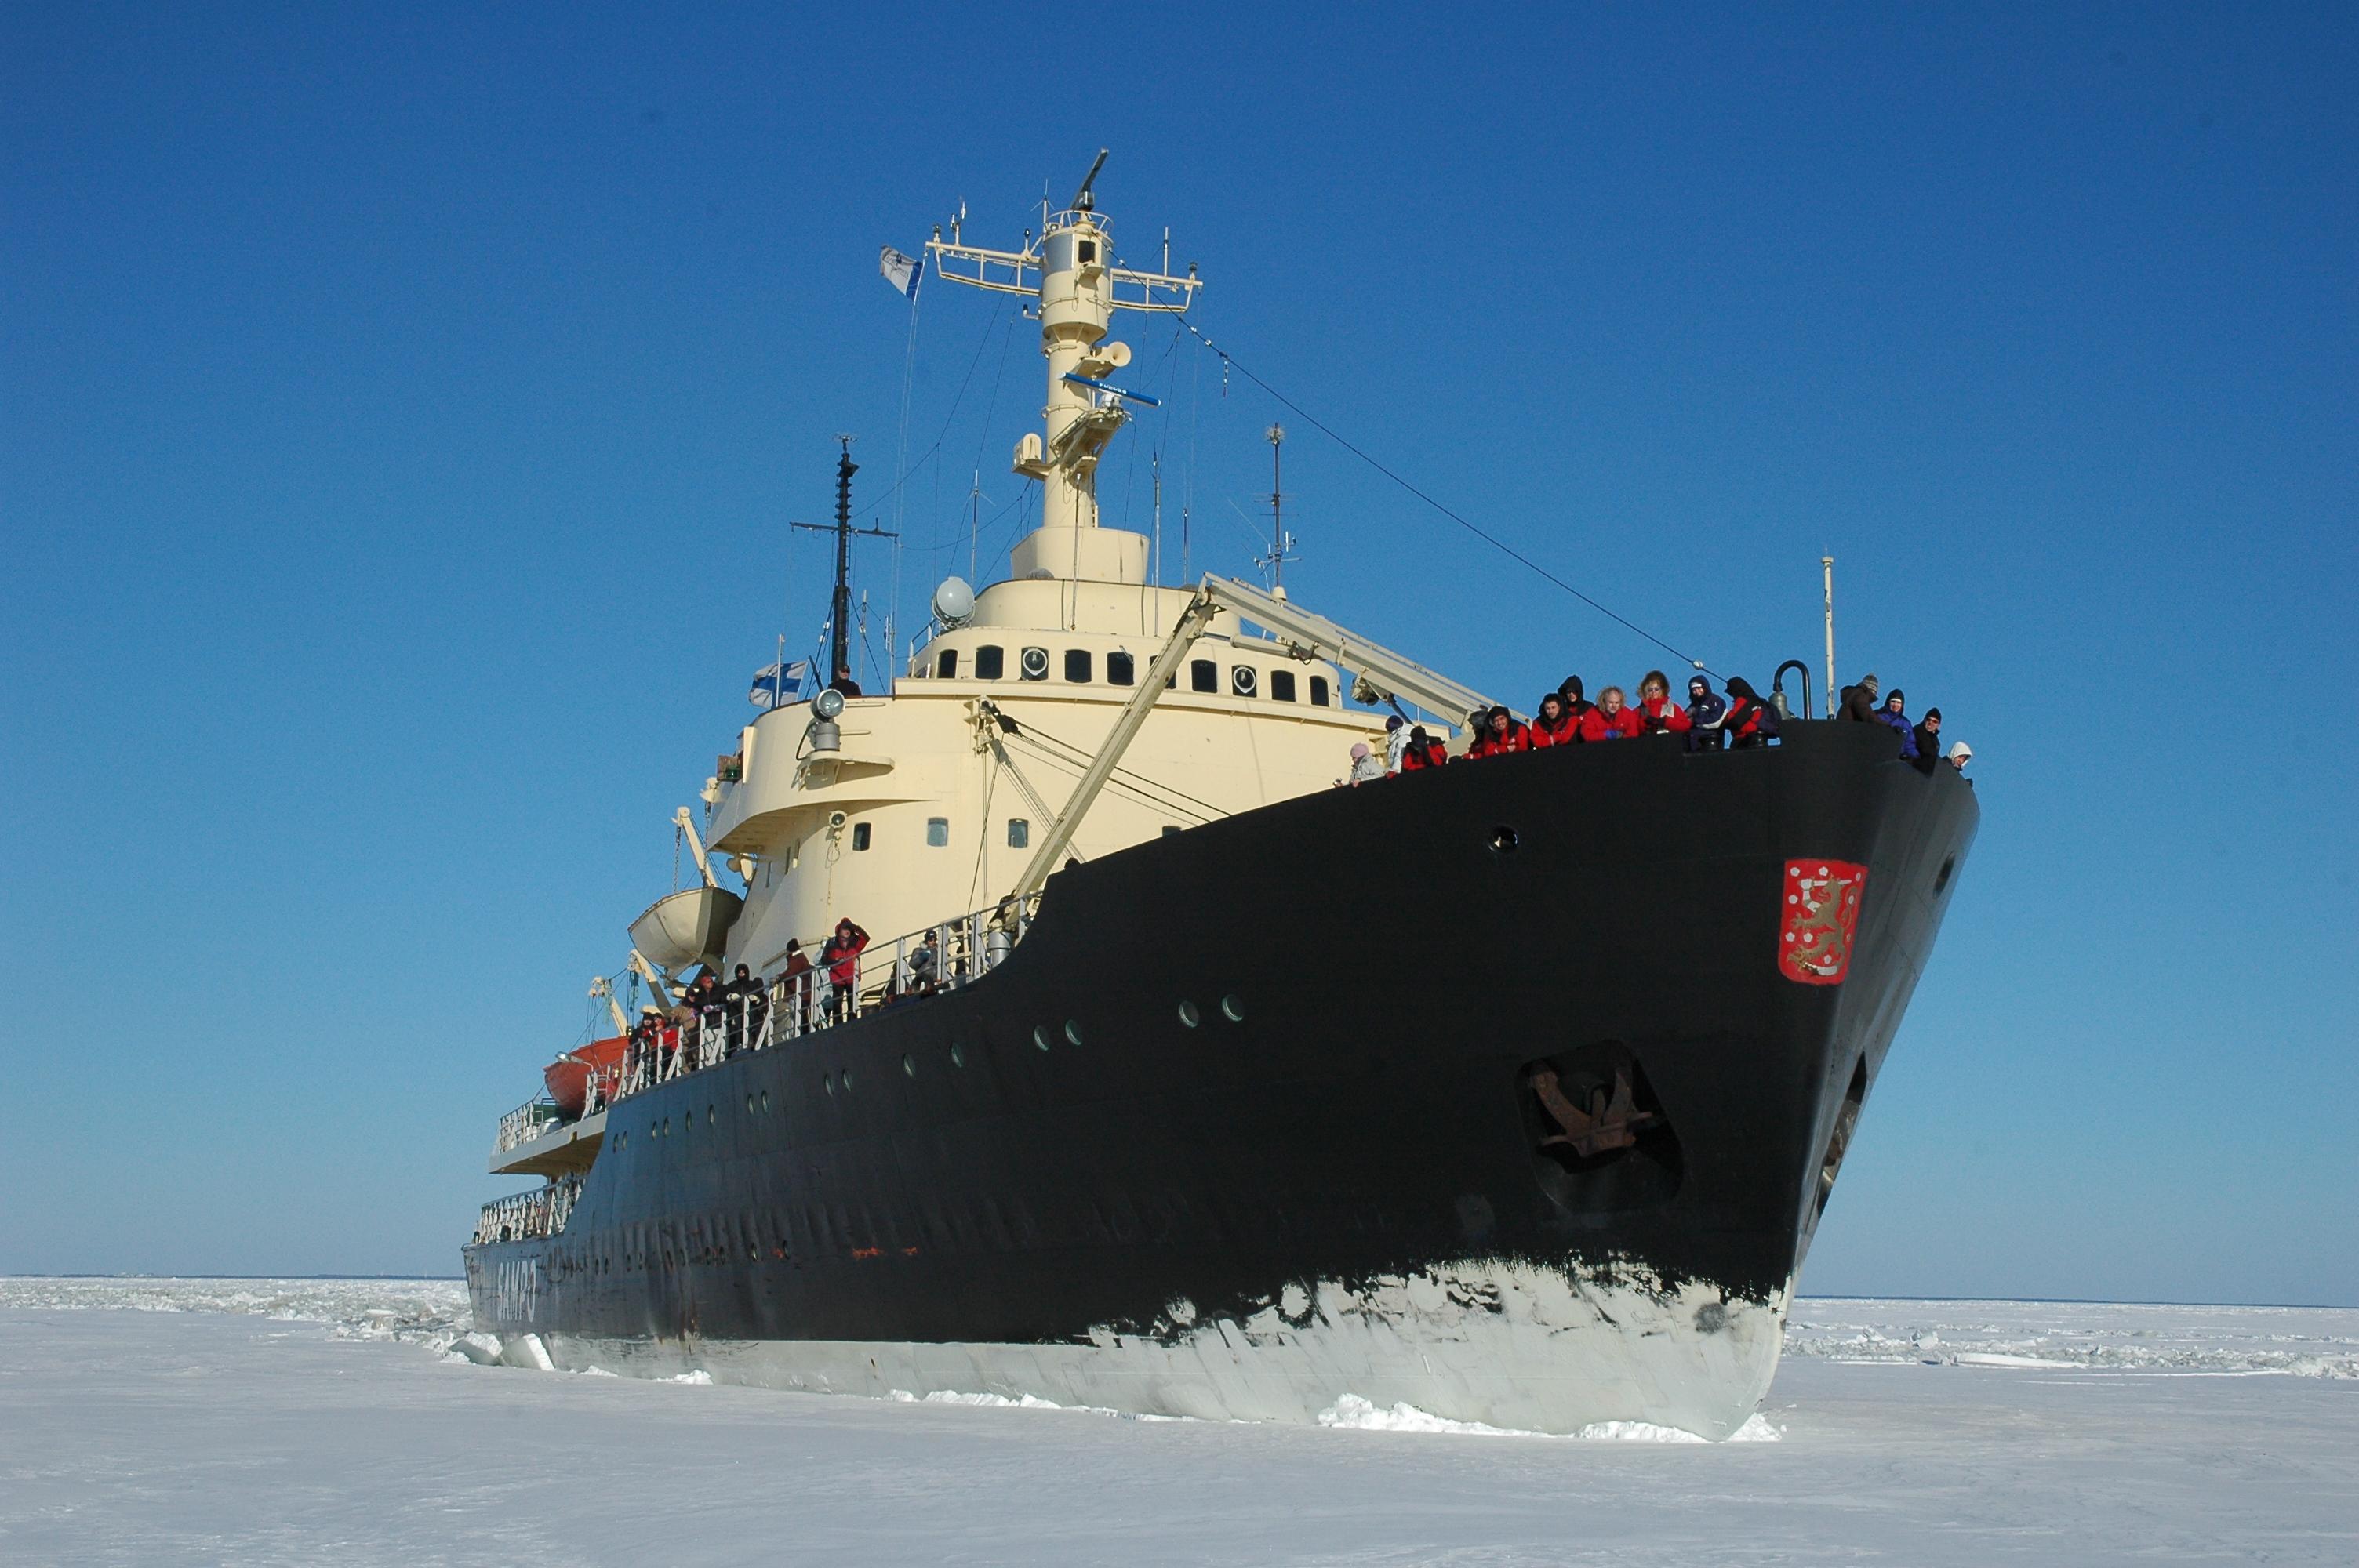 Icebreaker Cruises for 30 years in Kemi, Finland - ePressi  Icebreaker Crui...